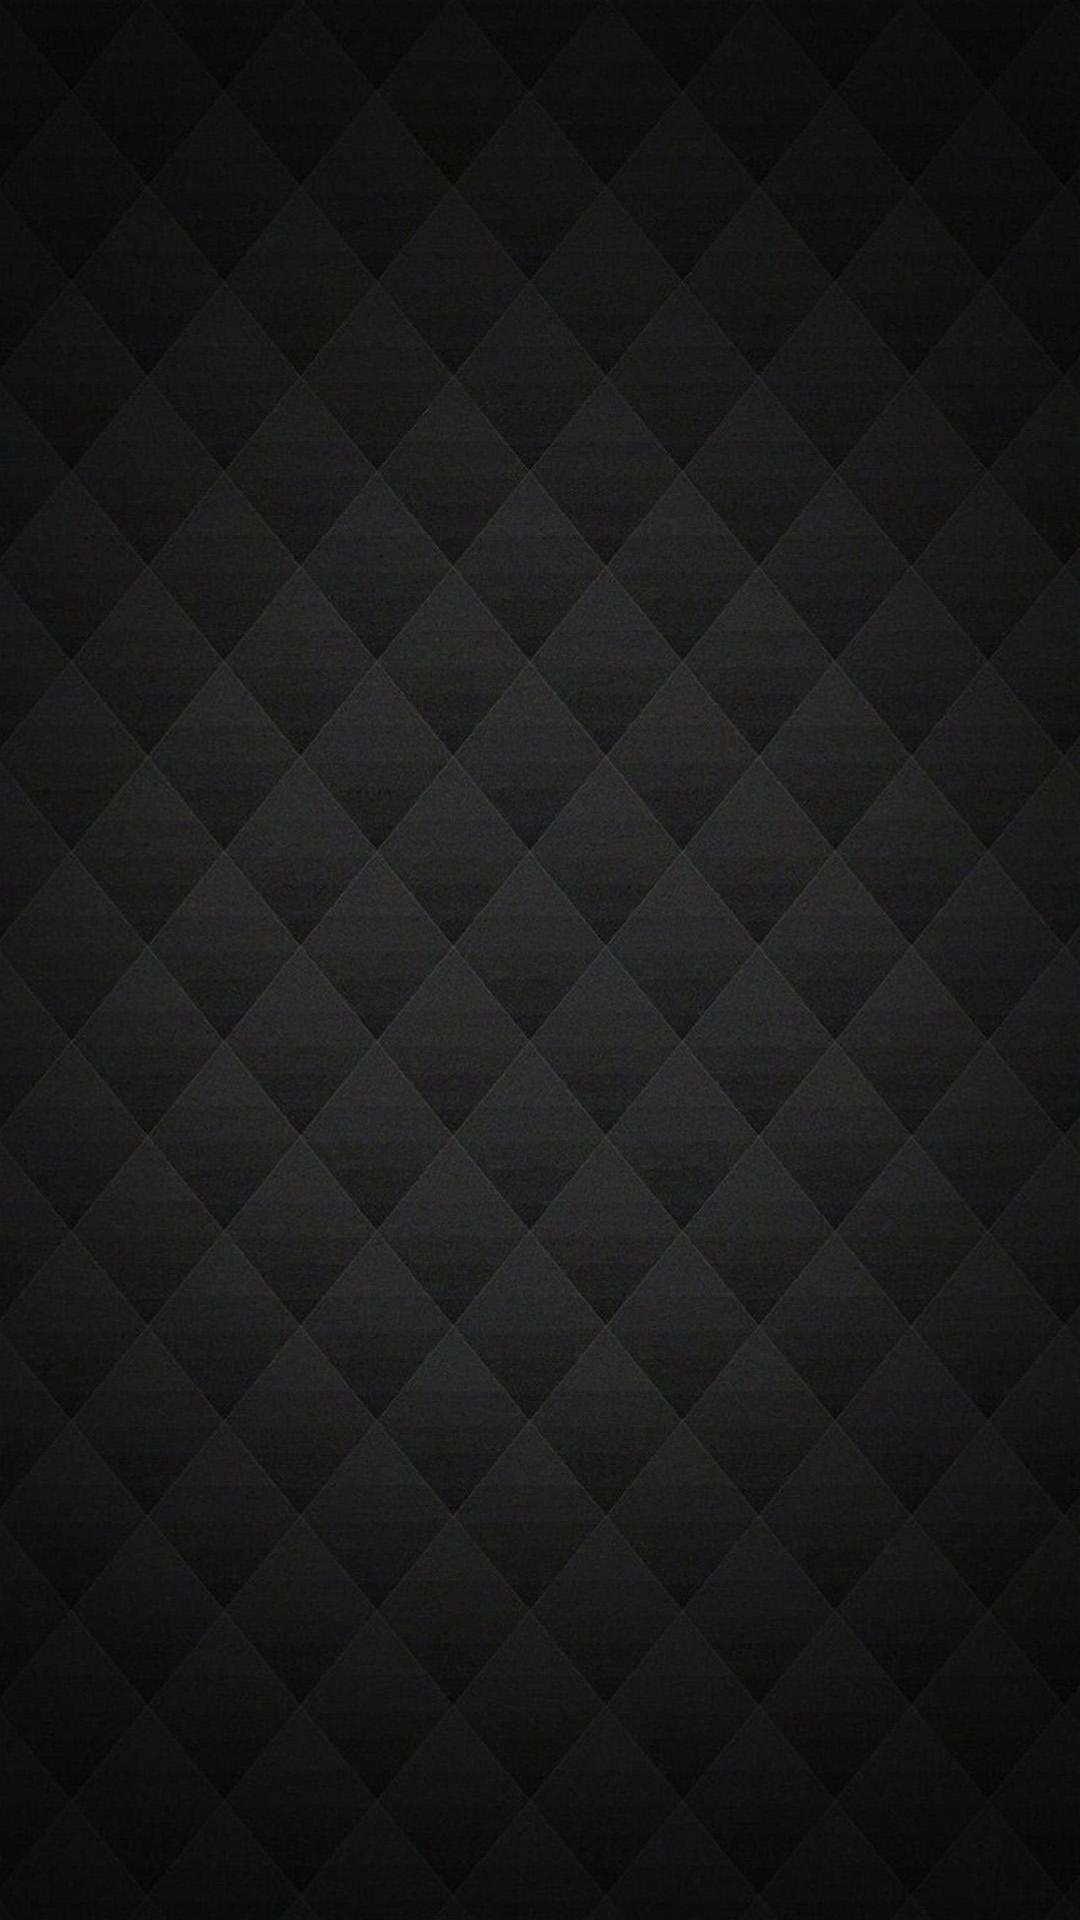 wallpaper.wiki-Download-Free-Carbon-Fiber-iPhone-Wallpaper-